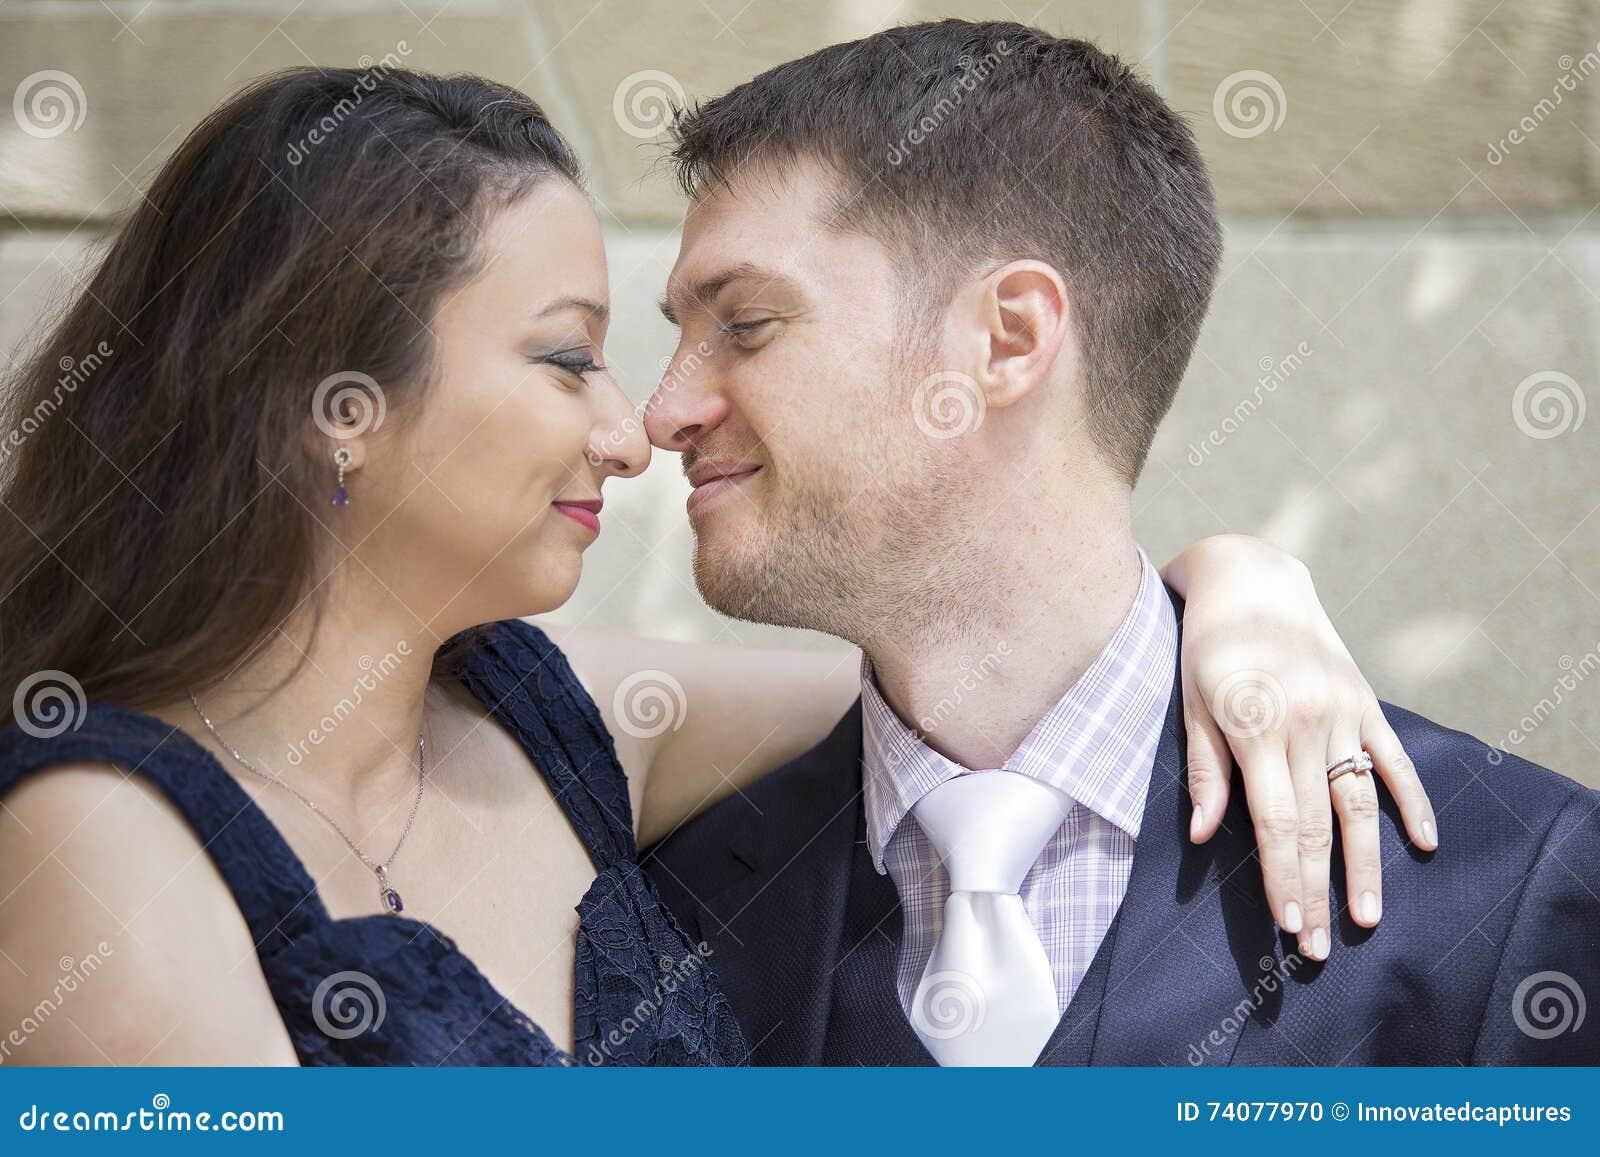 Engagierte Paare